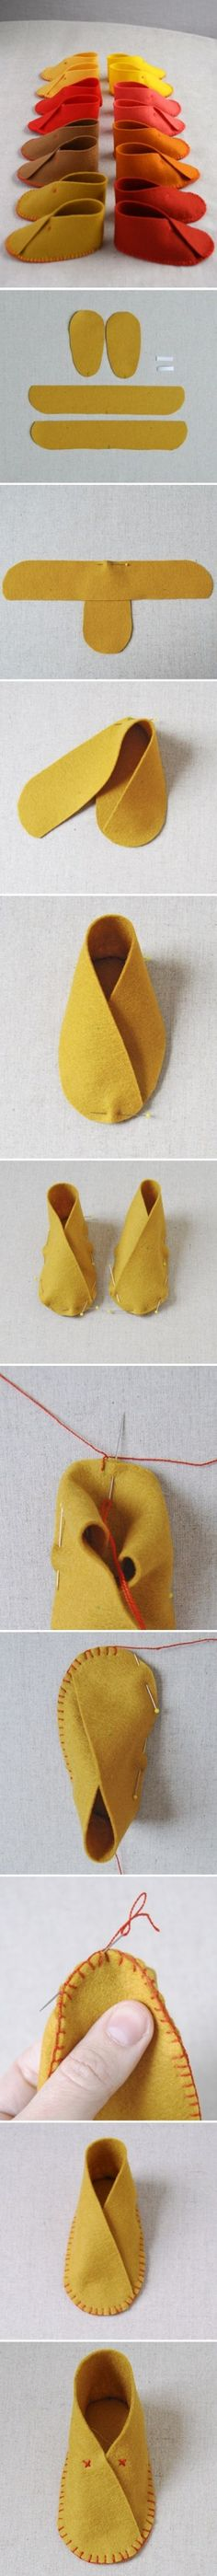 DIY : The Cutest Felt Baby Shoes by kasrin.knackebrot